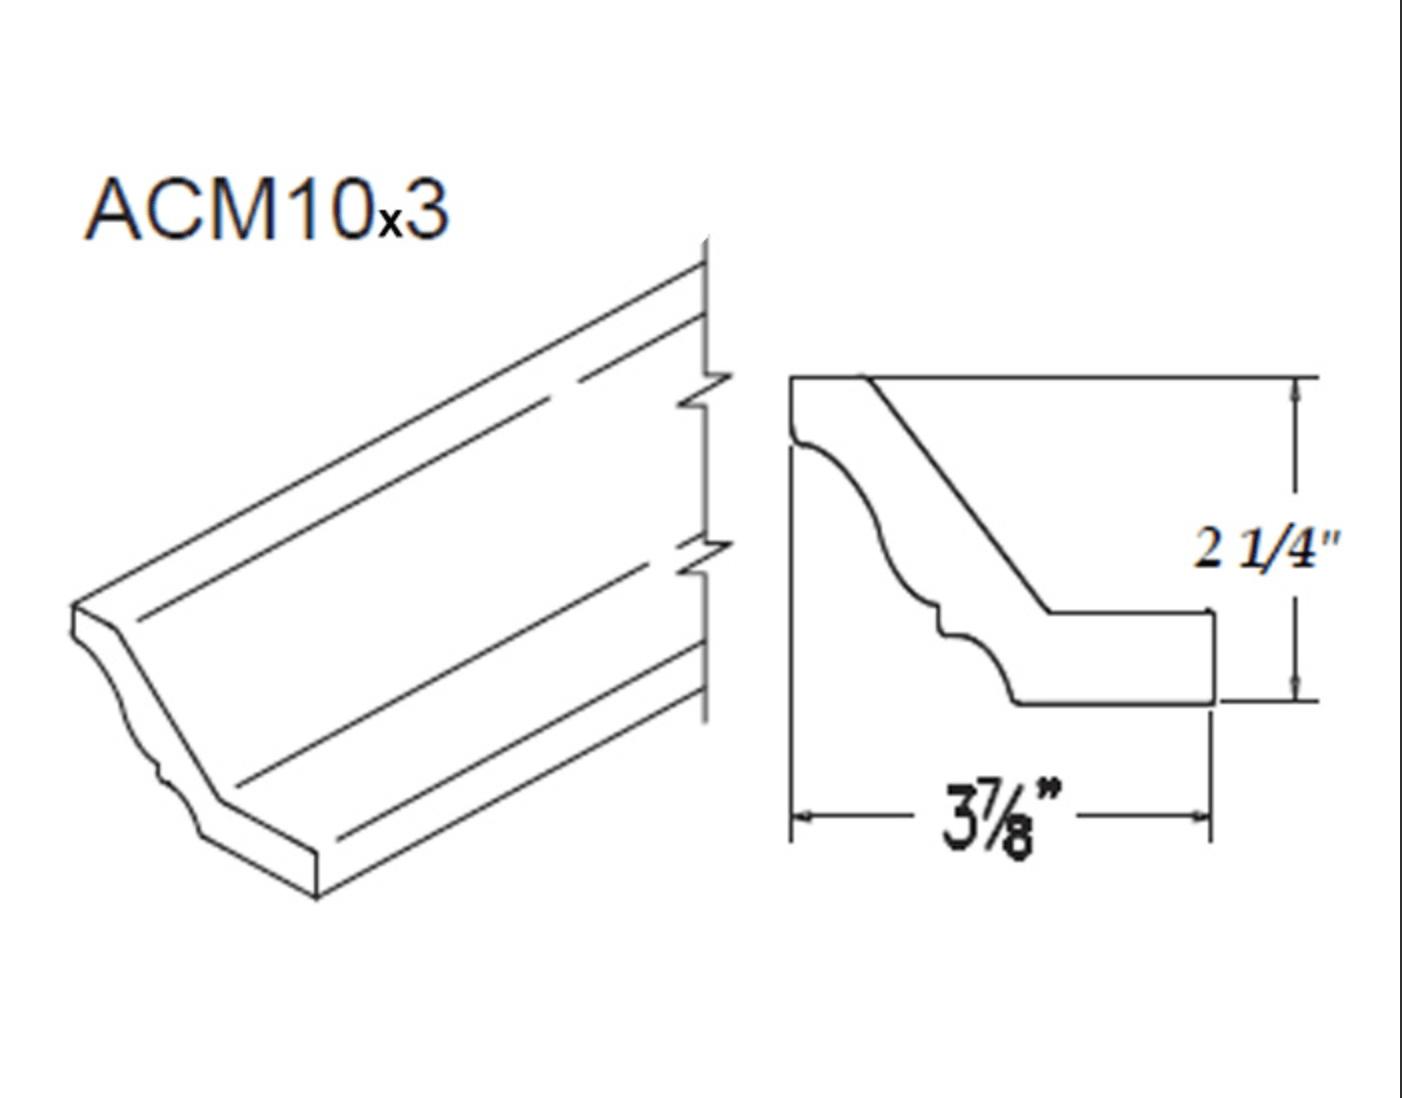 Moldings - Large Crown - 3